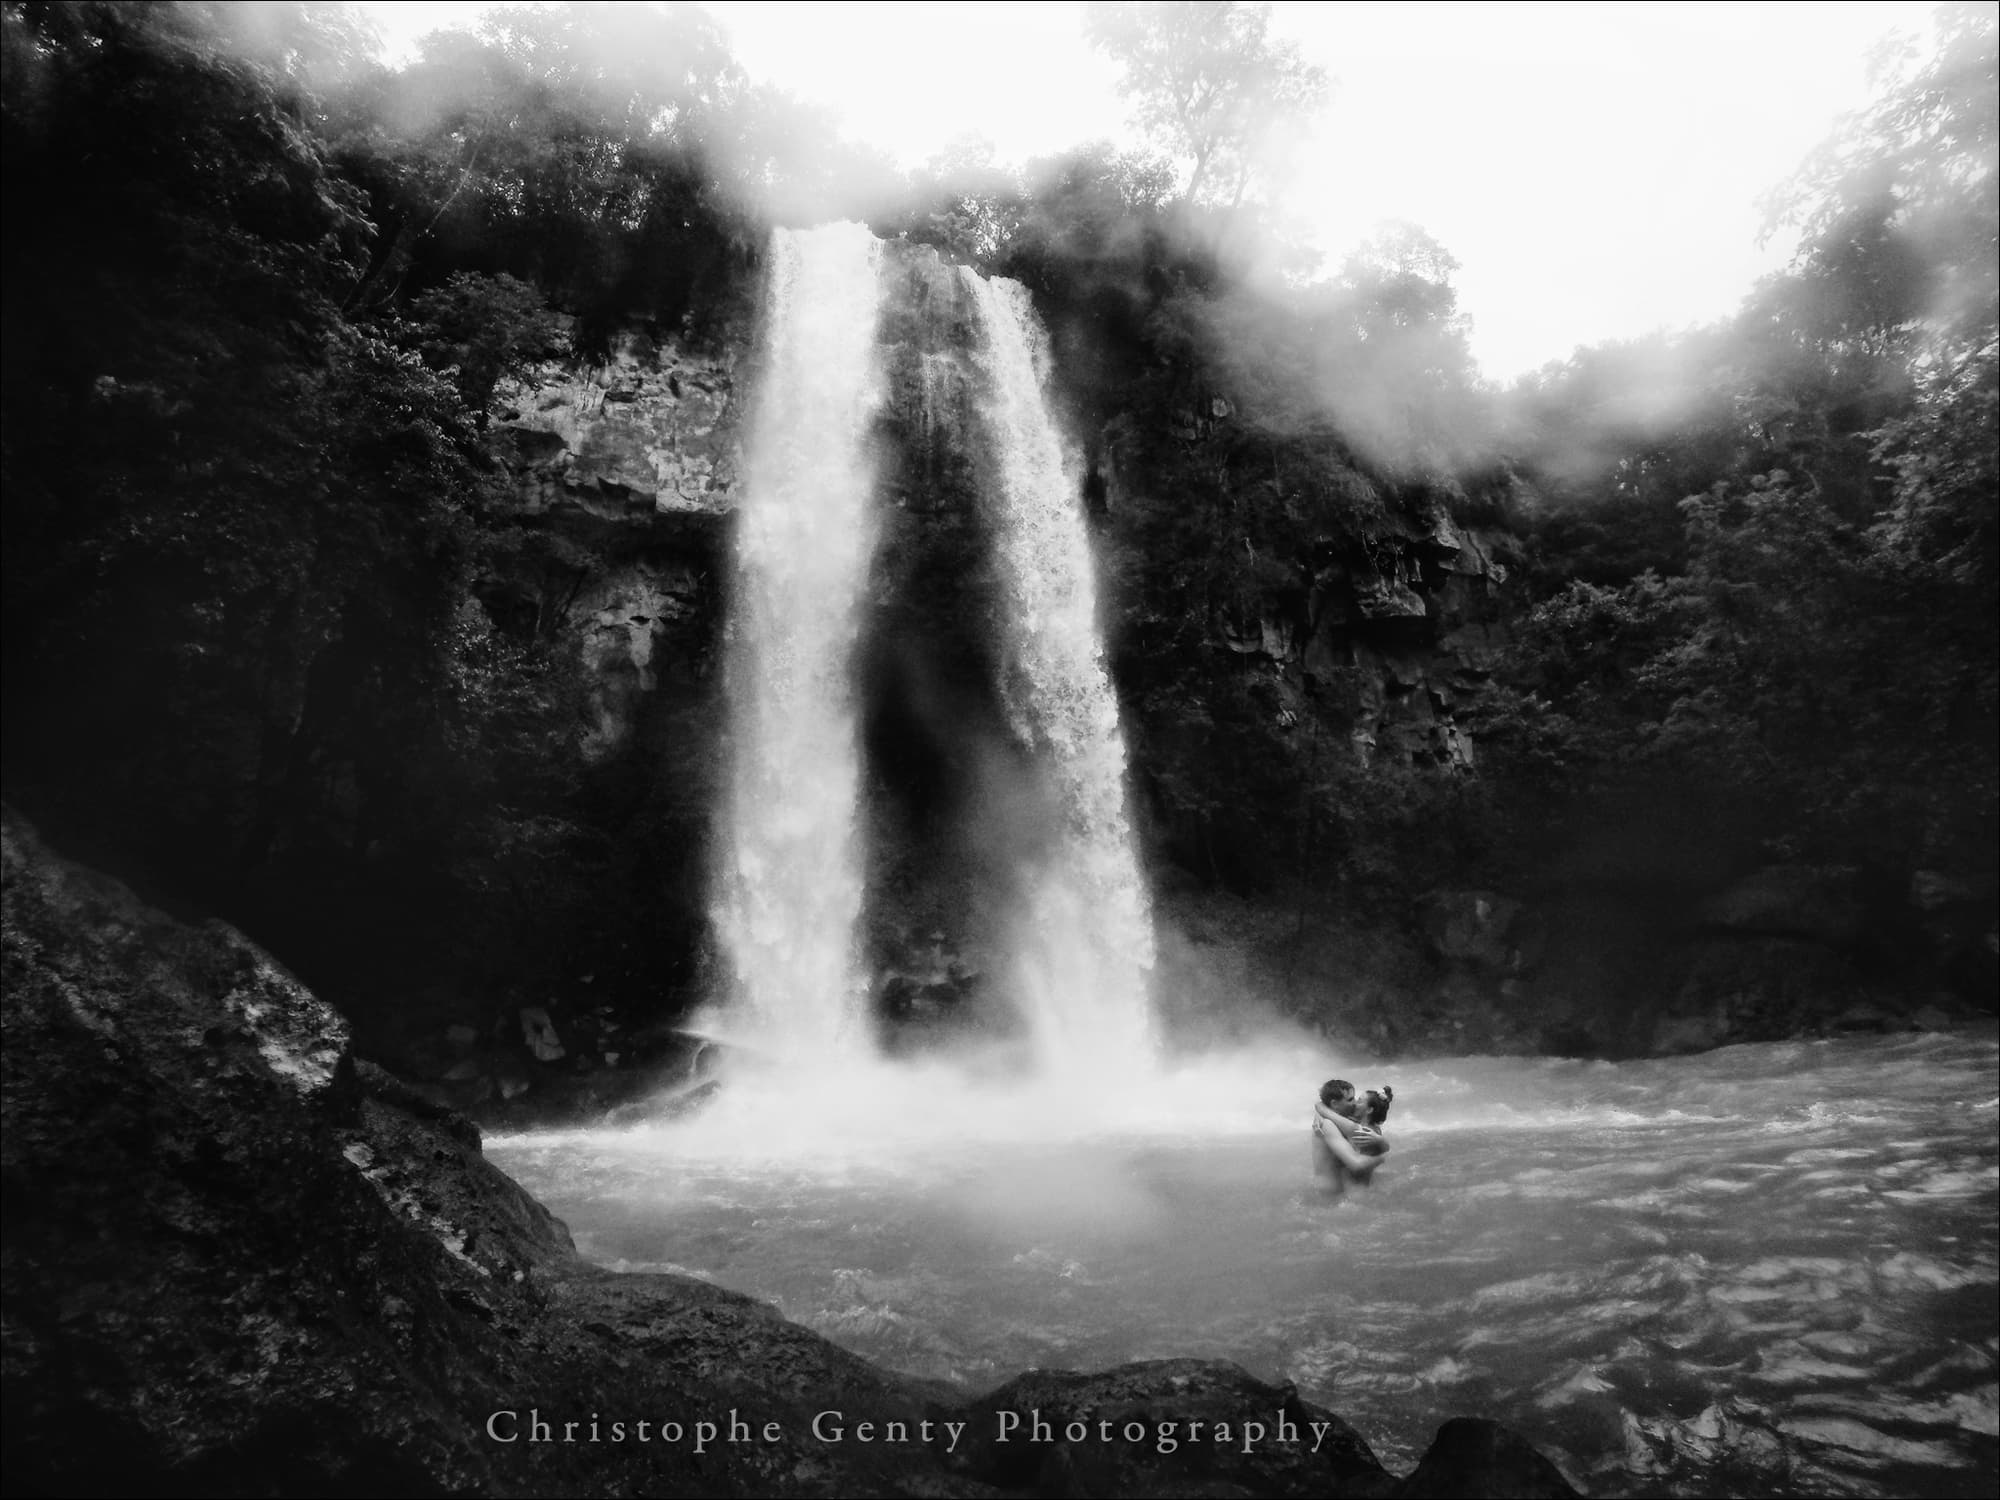 Yamile & Augusto, Iguazu Falls, Argentina - December 2015